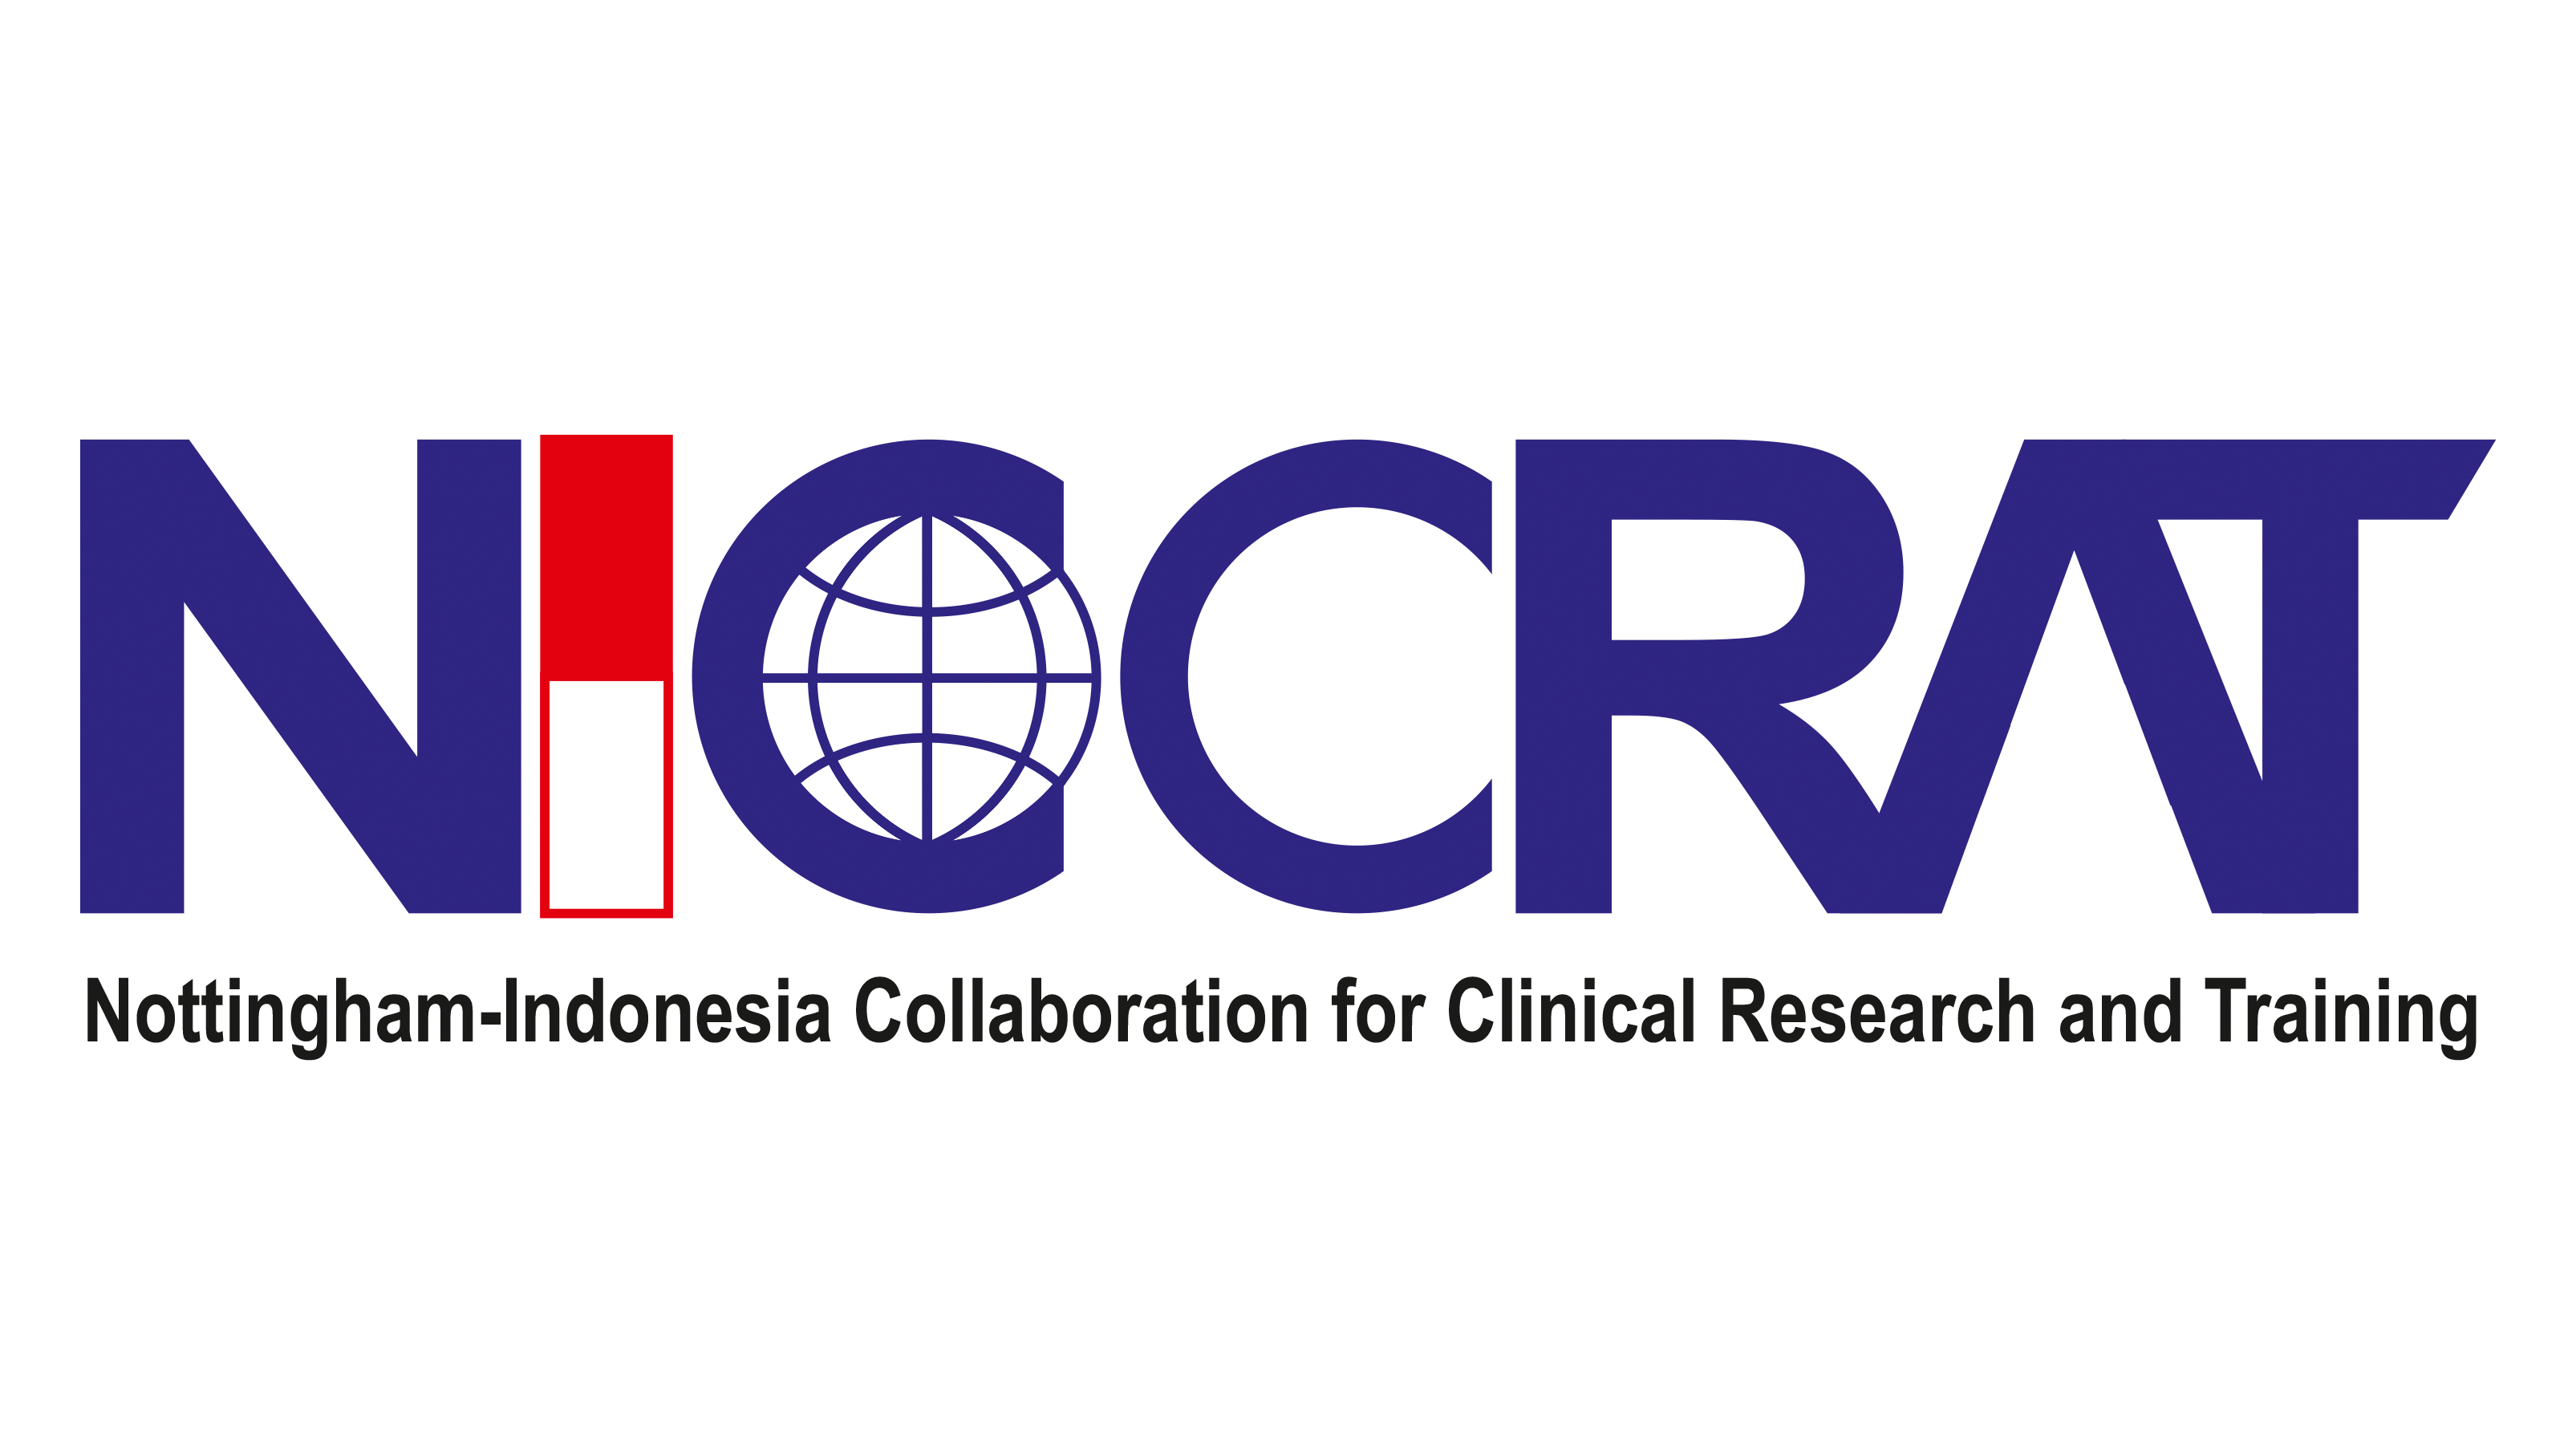 NICCRAT-Delivering Impact Partnerships